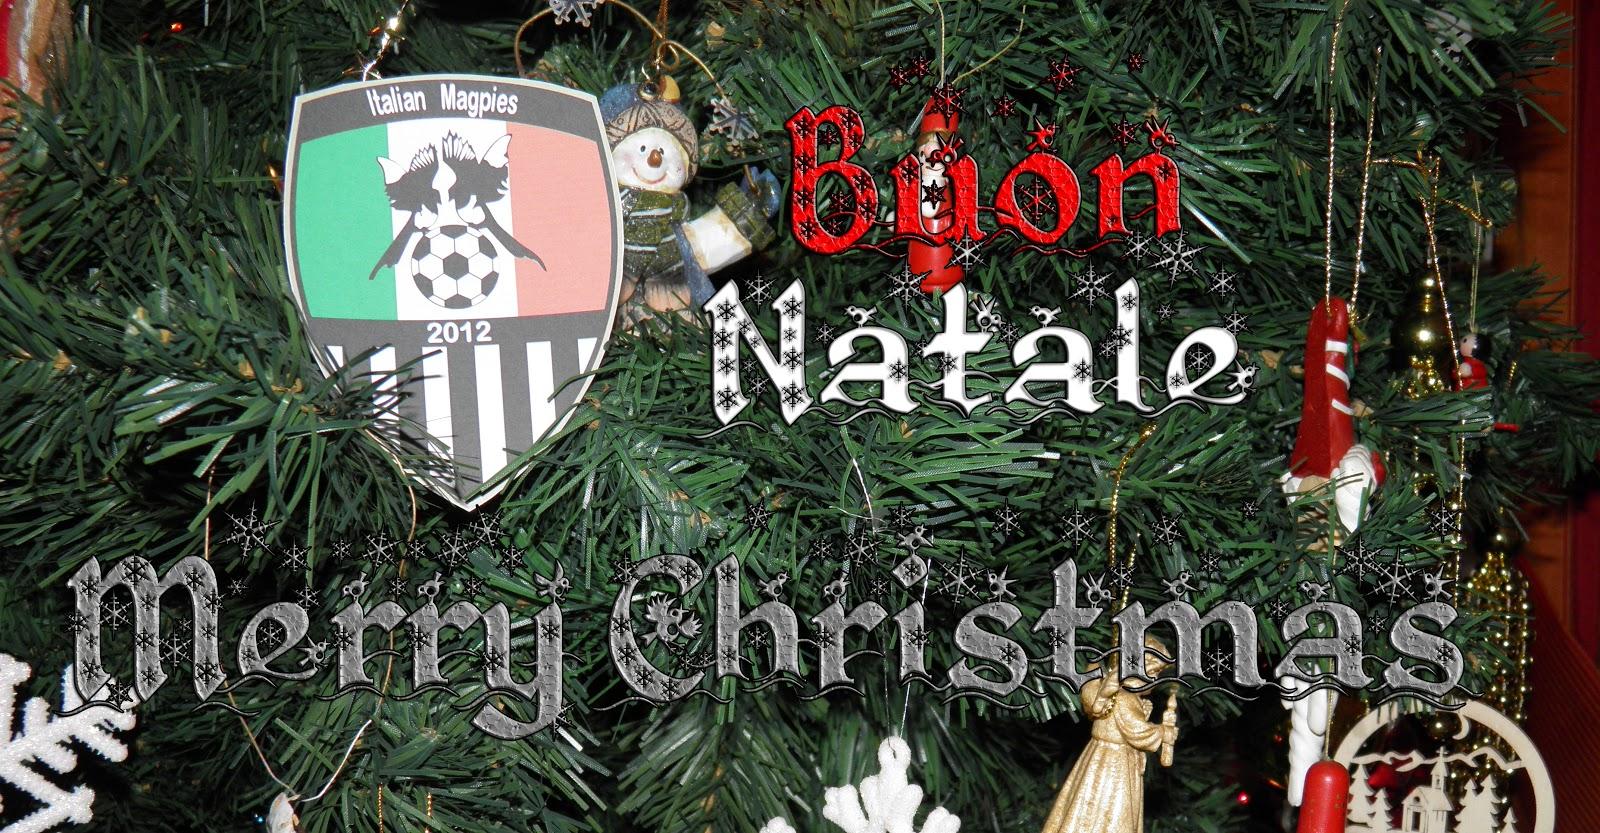 Juventus Buon Natale.Italian Magpies Buon Natale Merry Christmas